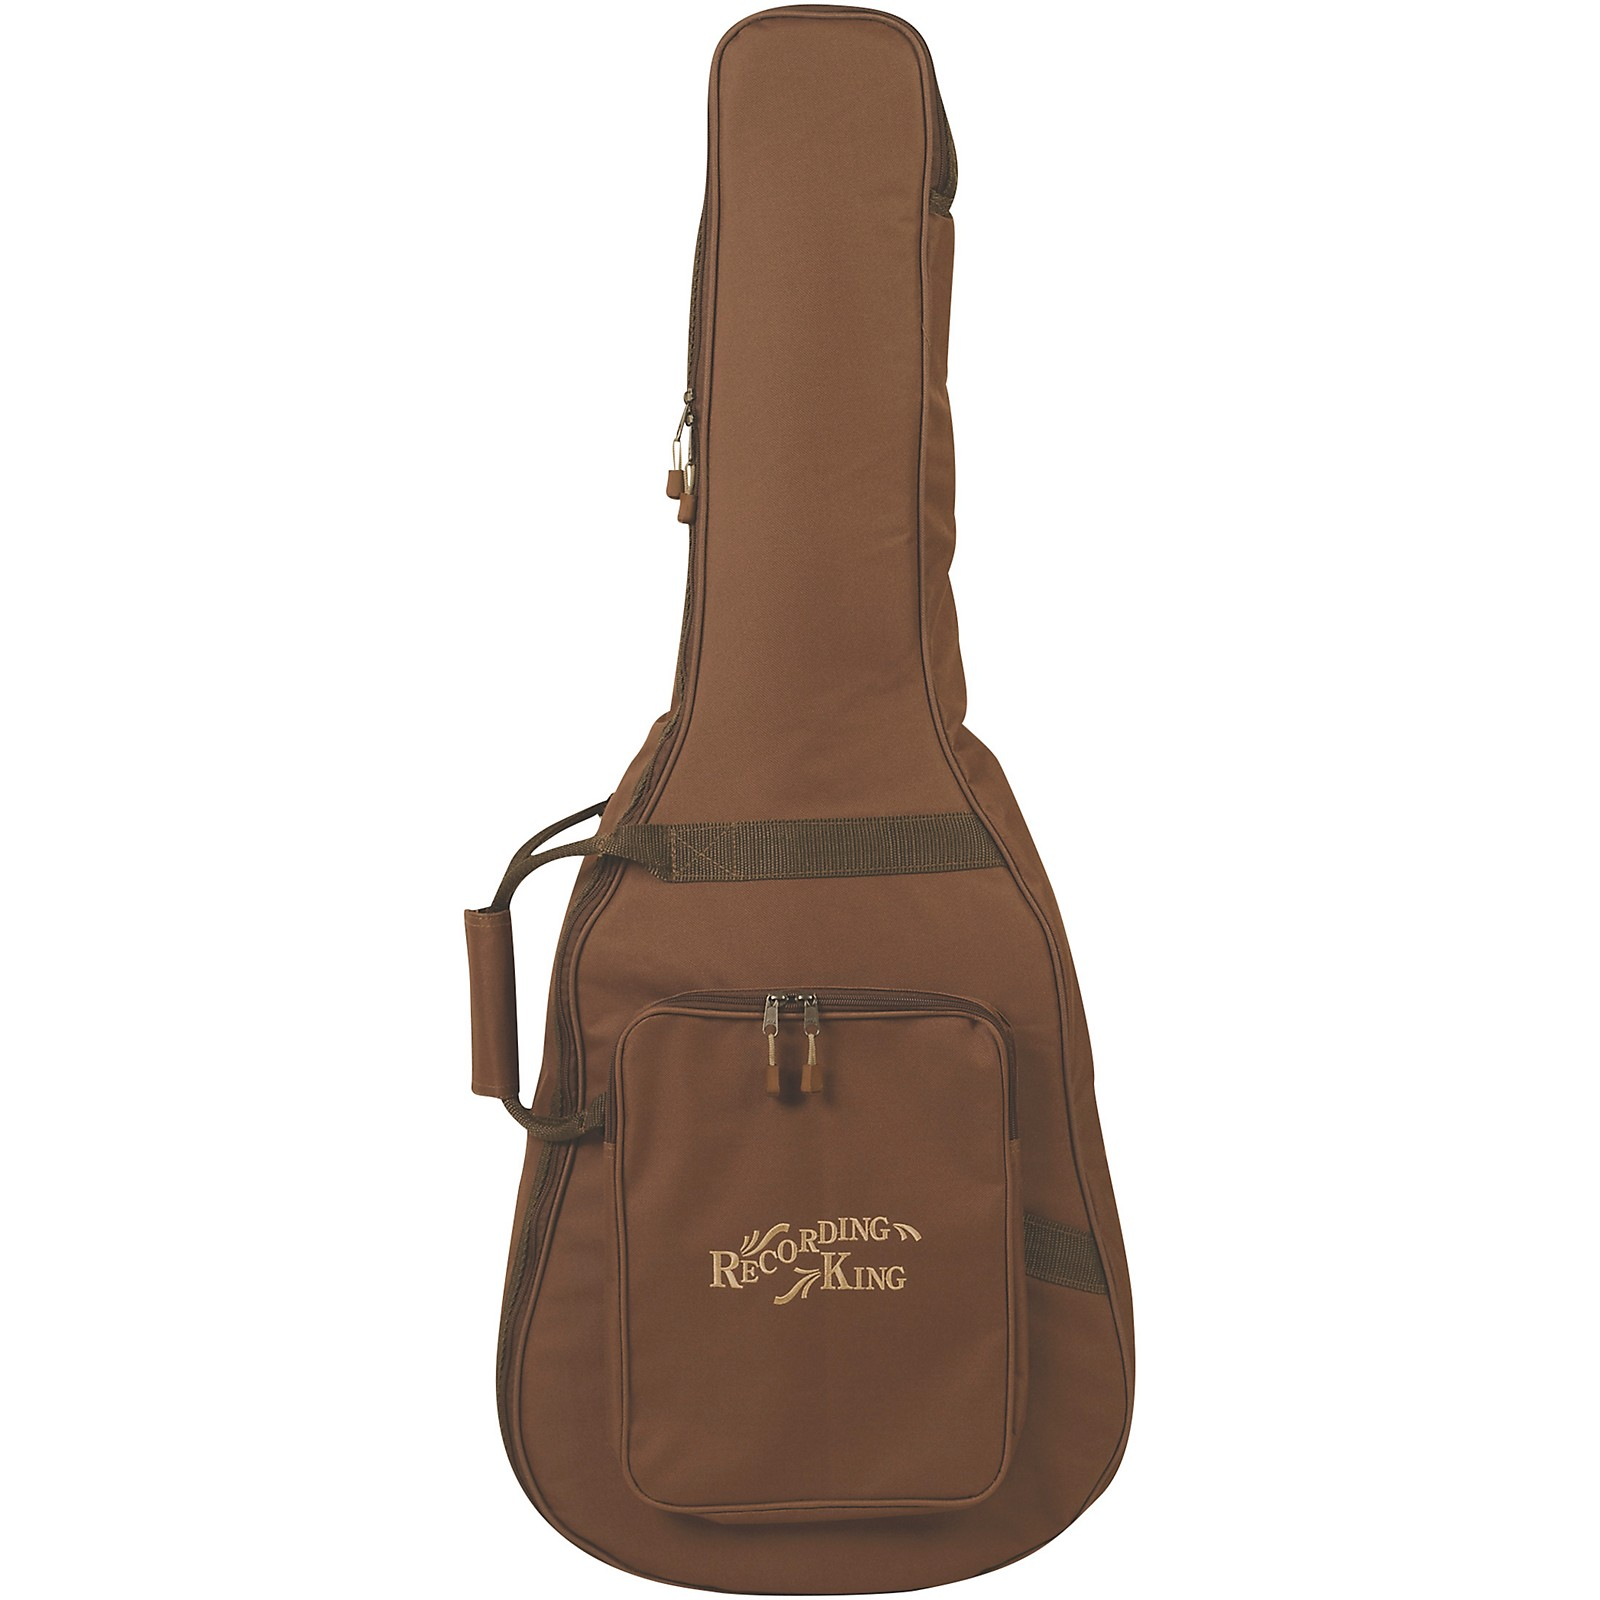 Recording King 250 Series 000 Acoustic Guitar Gig Bag